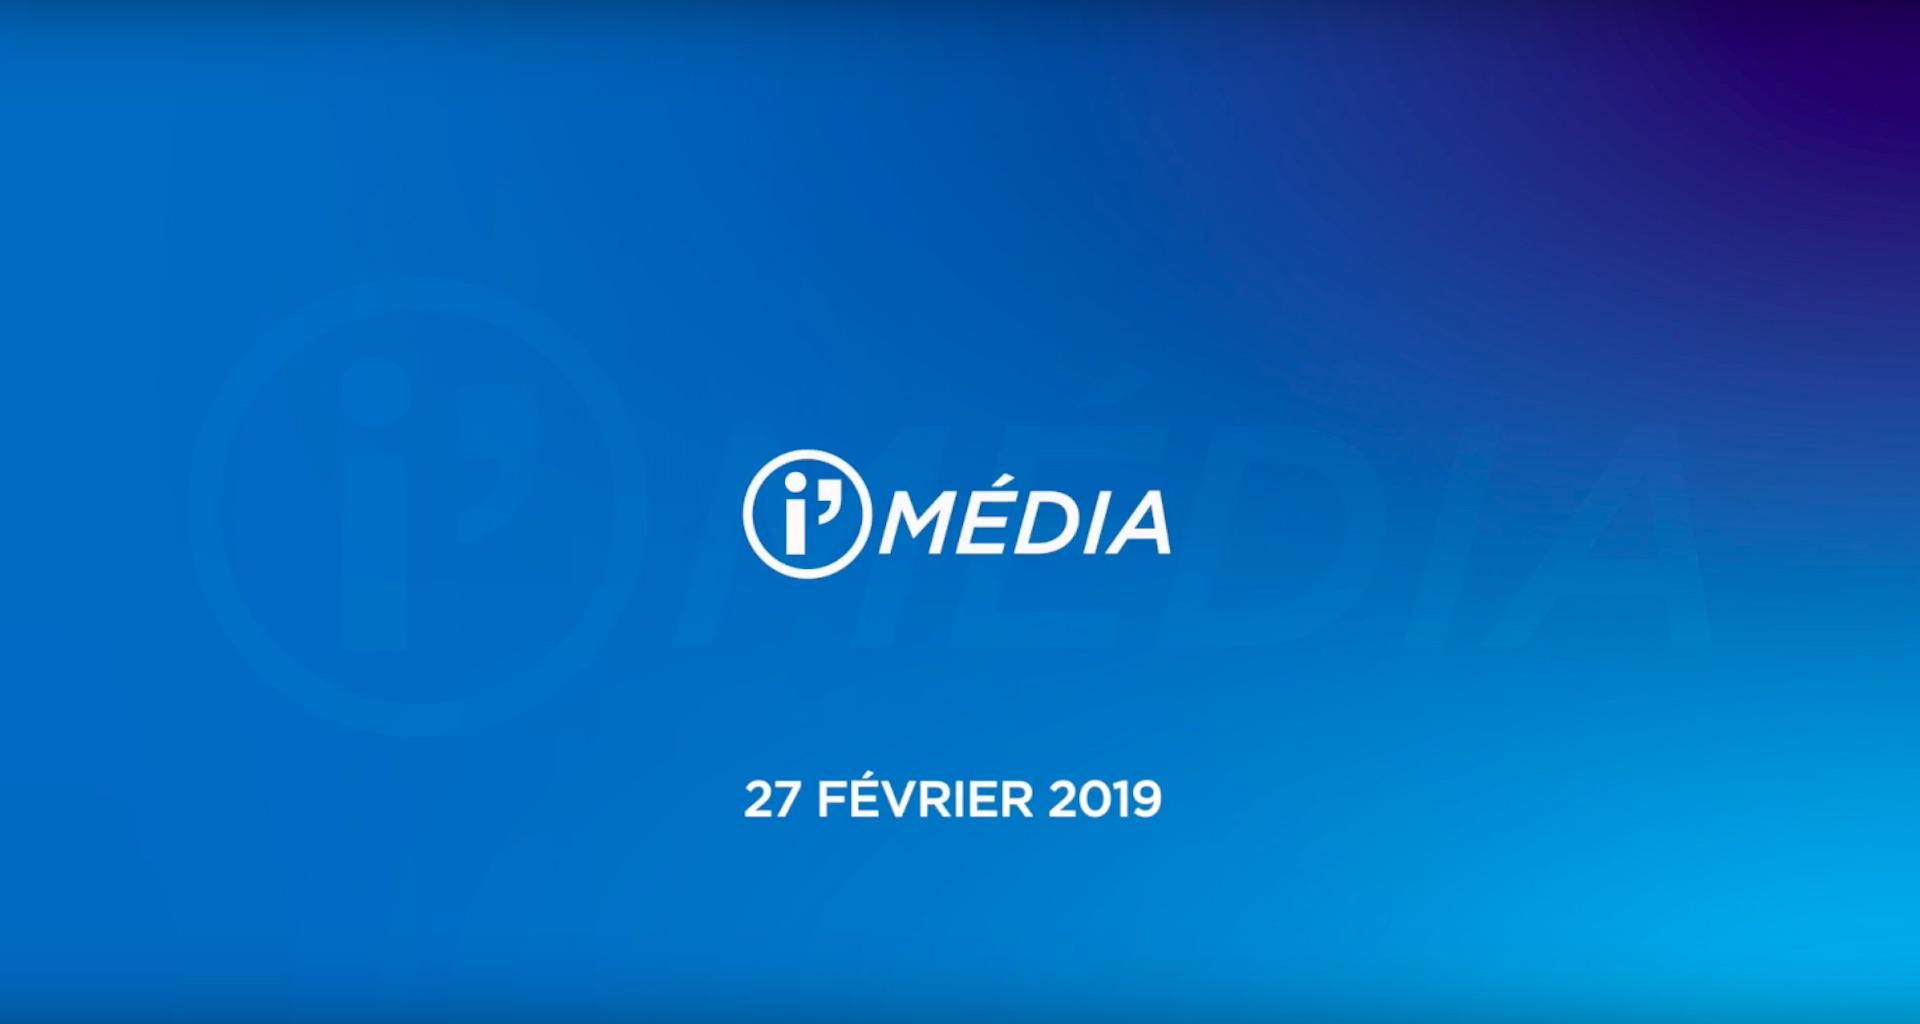 I'média 27.02.2019